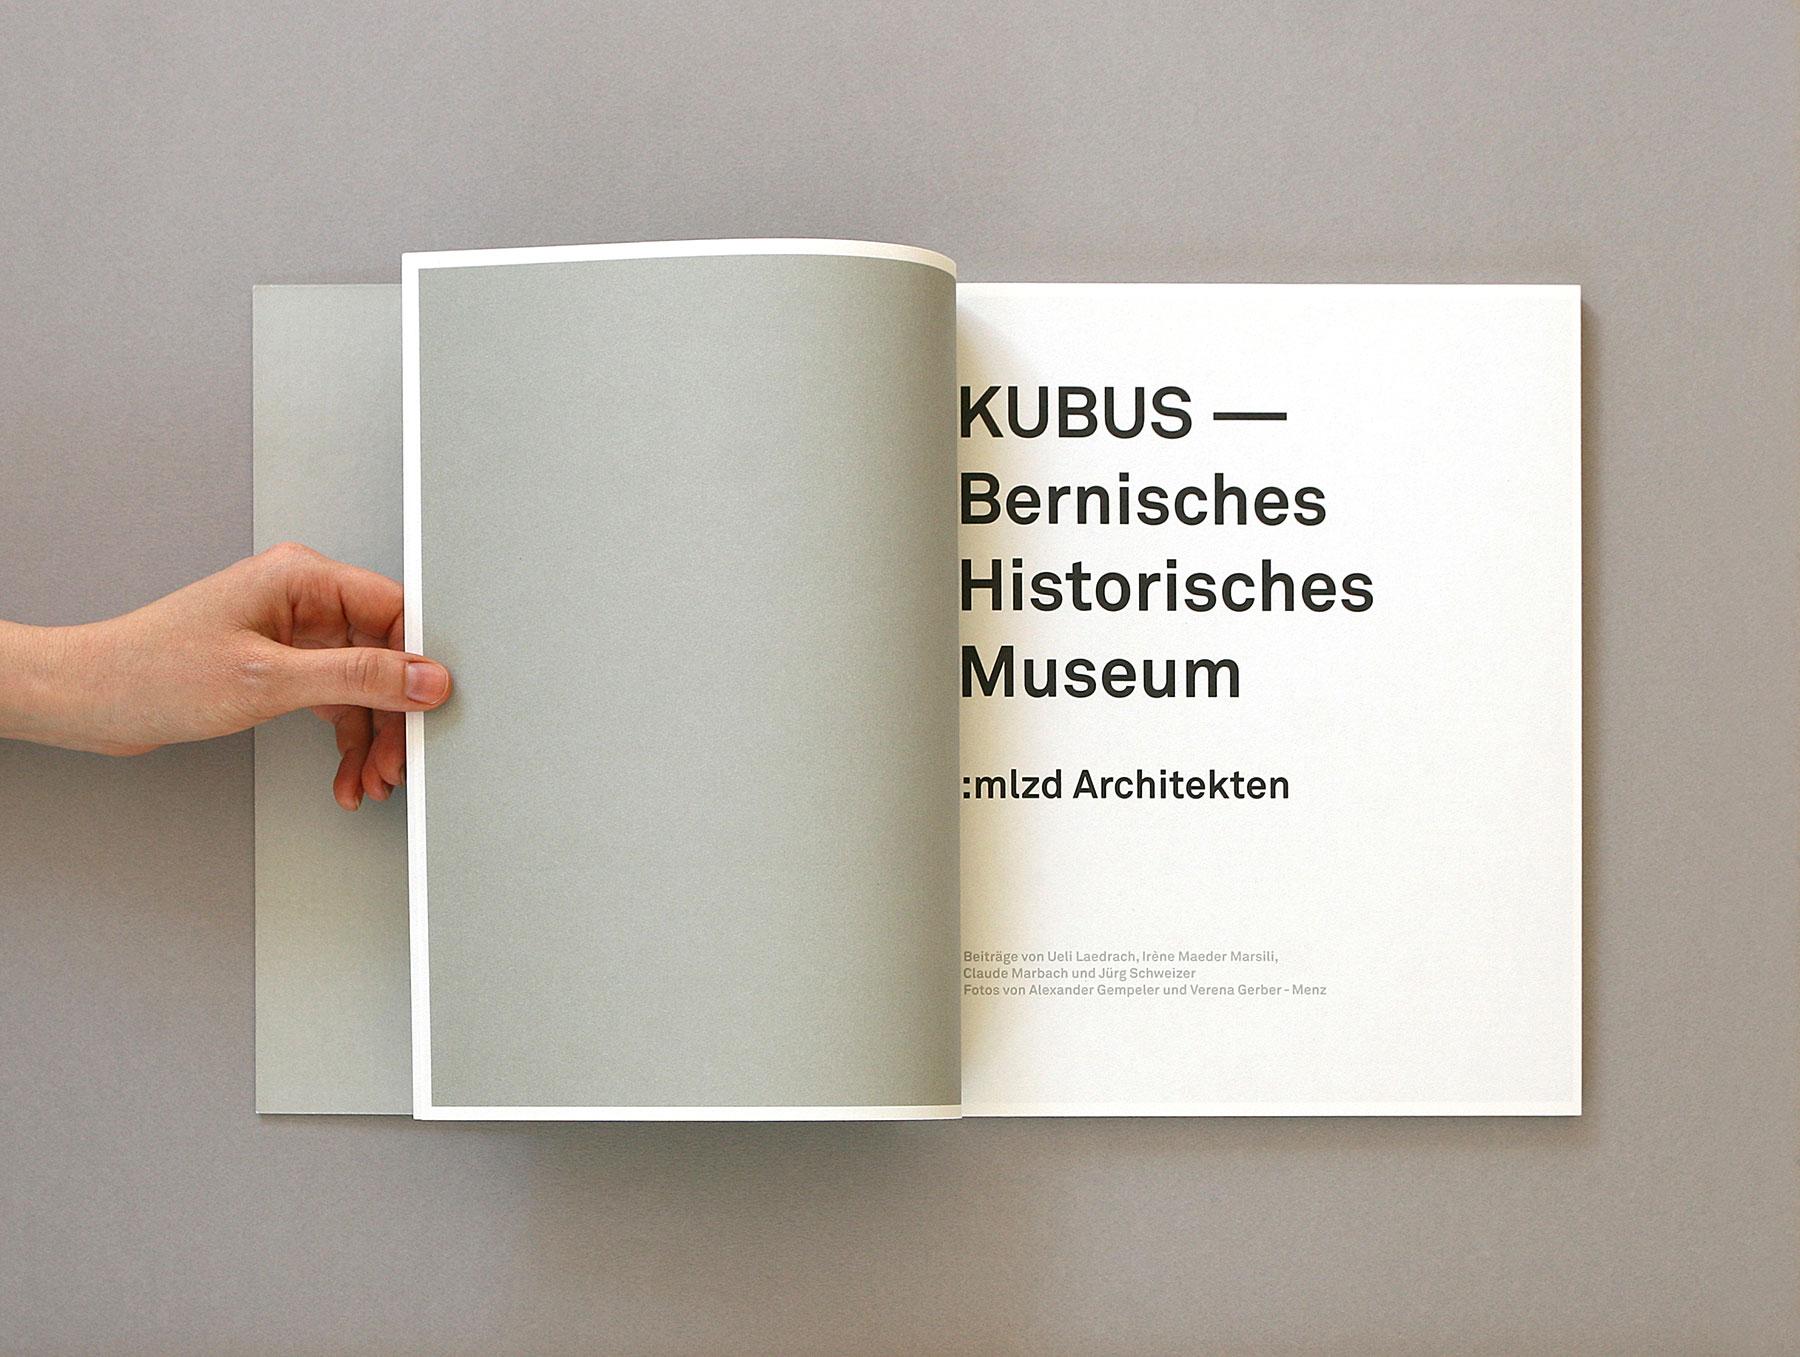 Bern-musee-01a